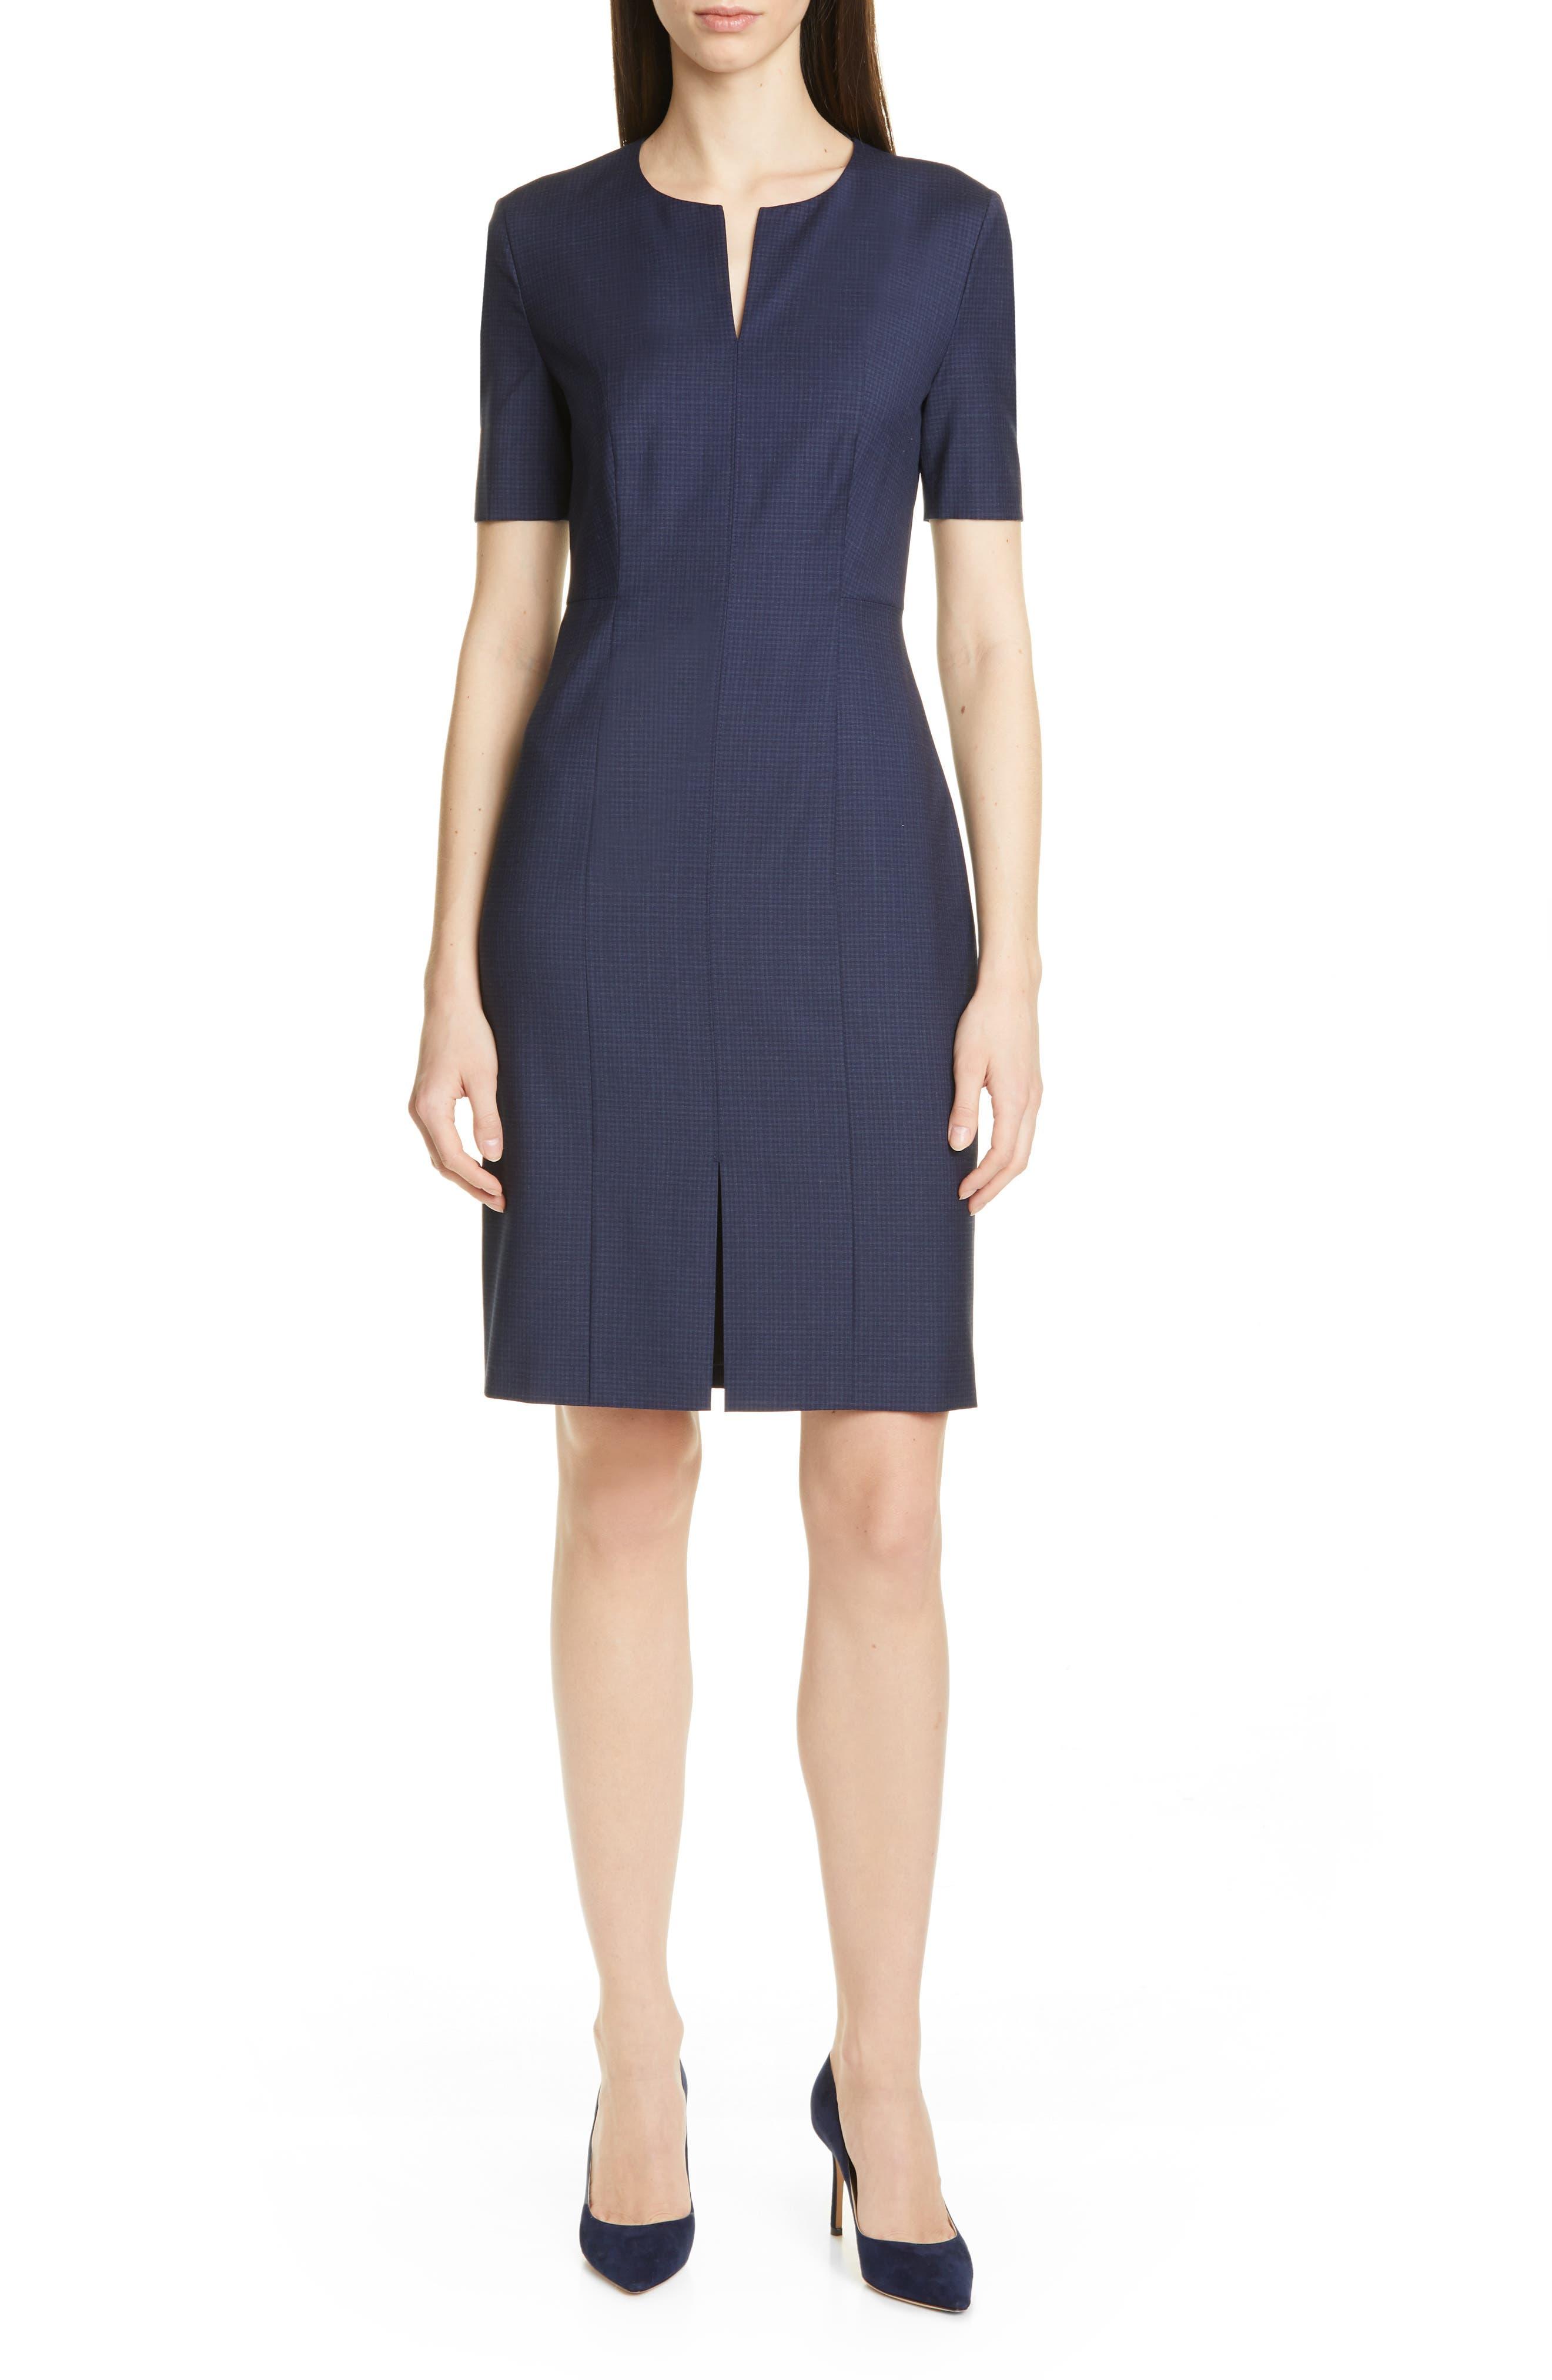 Petite Boss Delysia Small Check Wool Sheath Dress, Blue